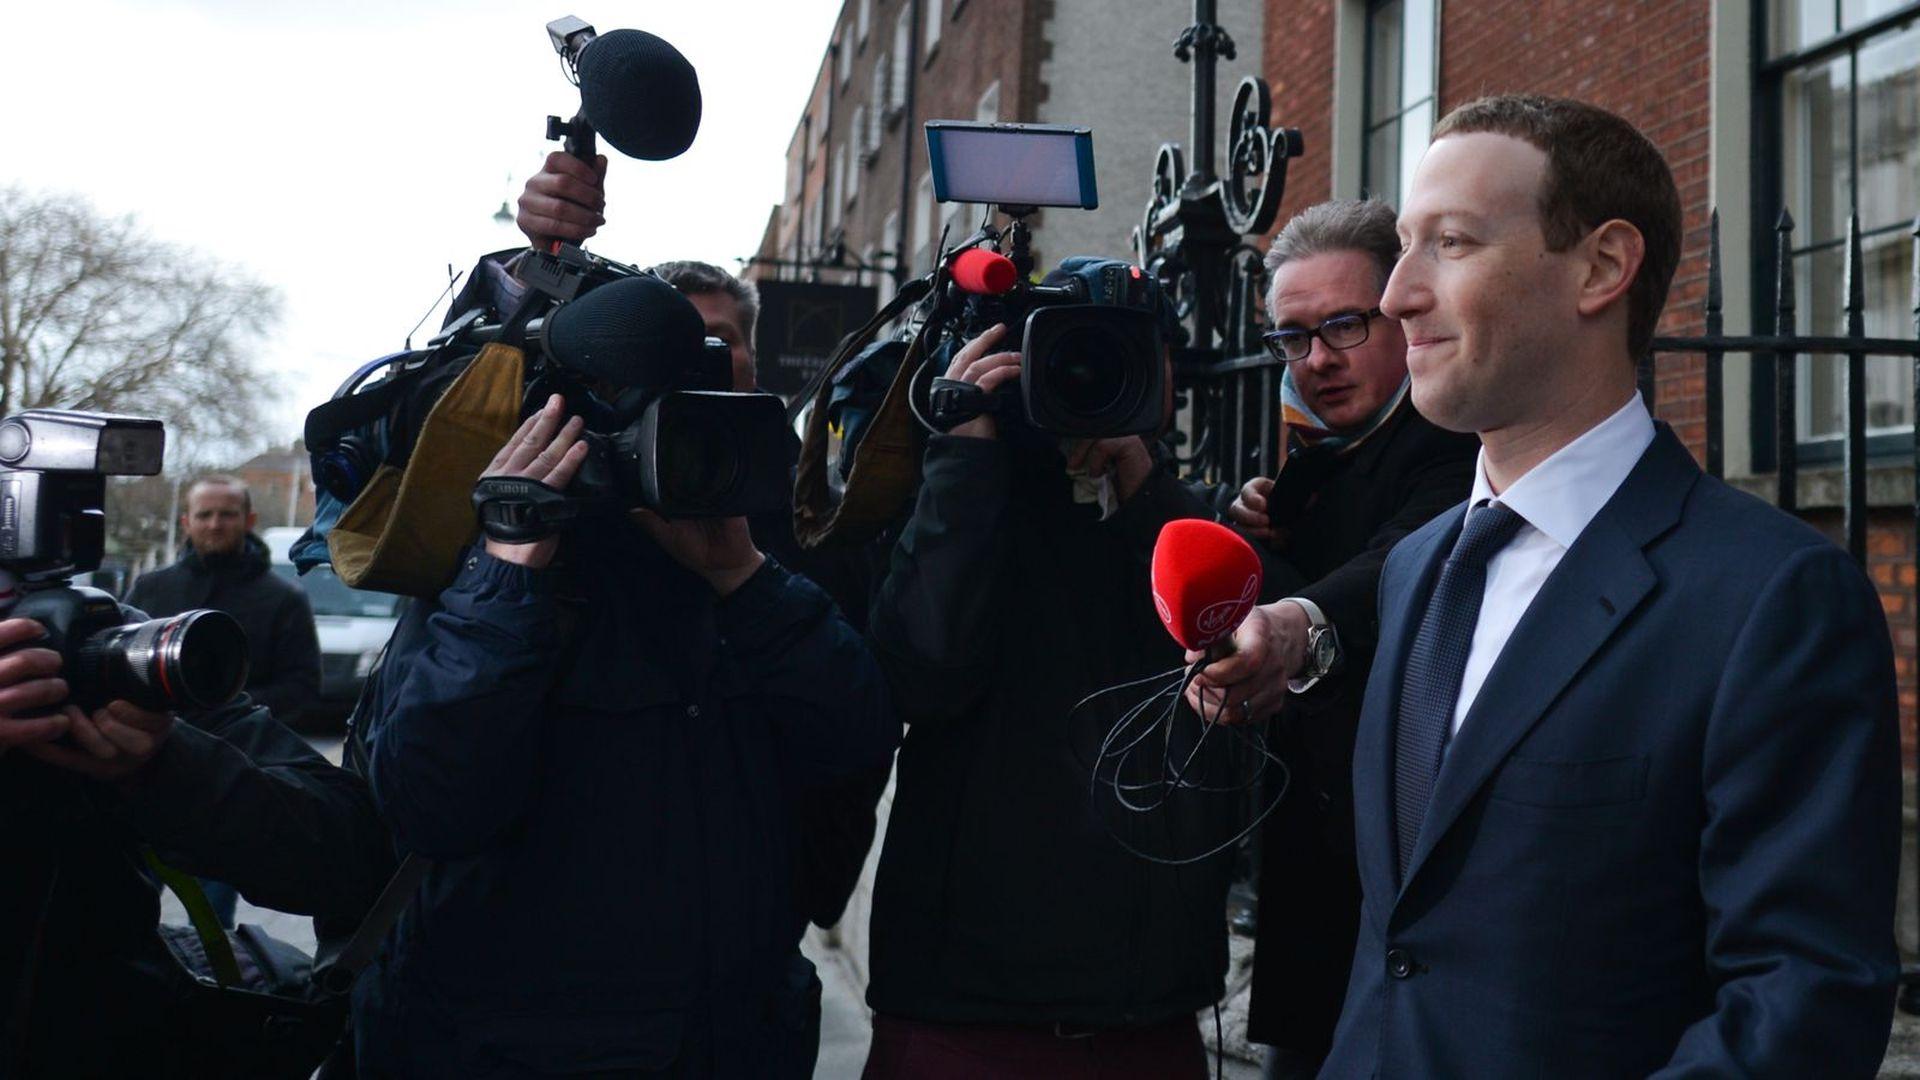 Facebook CEO Mark Zuckerberg in front of a bunch of TV cameras